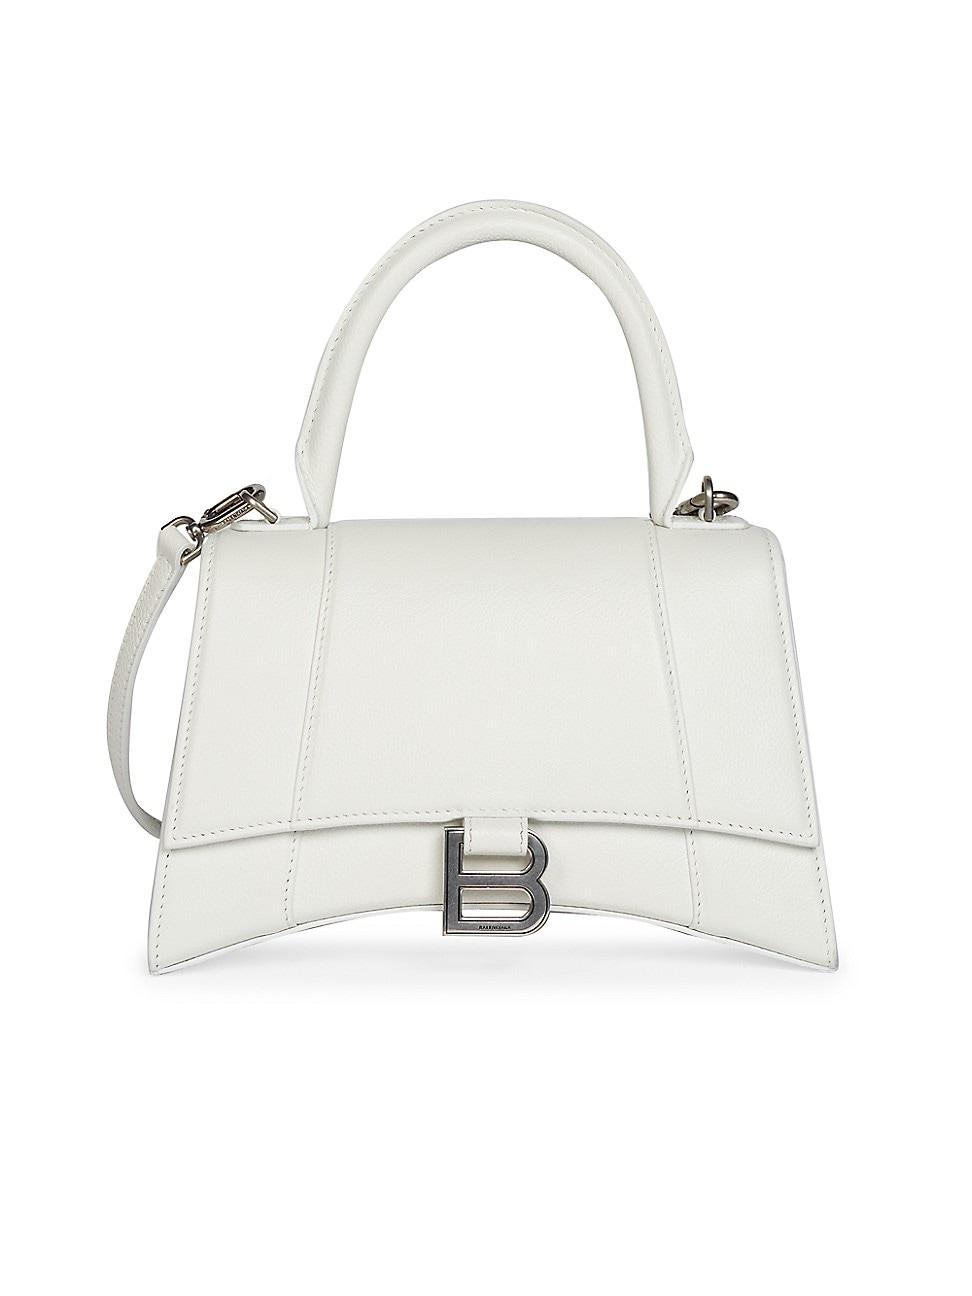 Balenciaga Women's Hourglass Leather Top Handle Bag In White